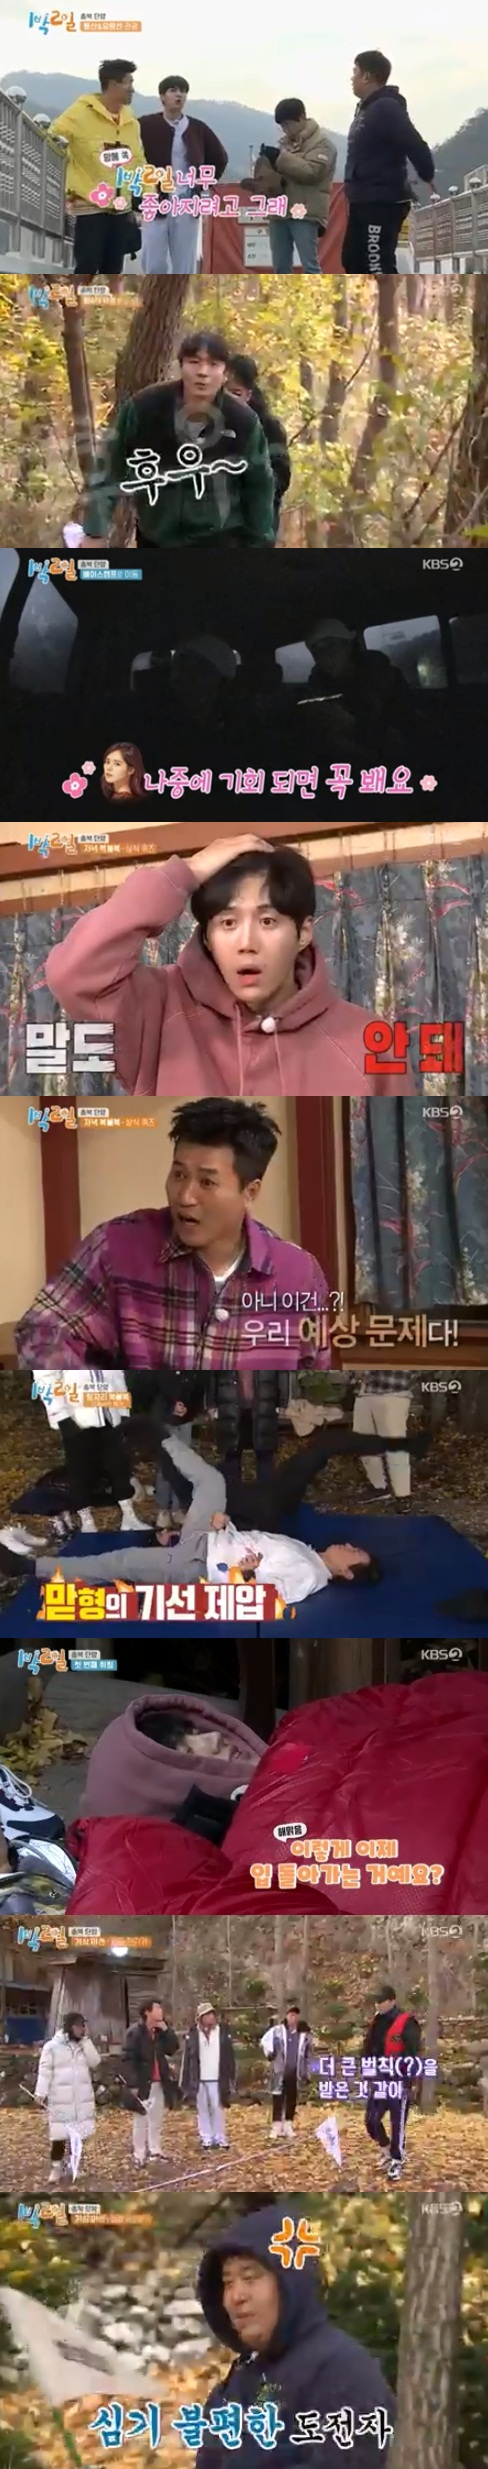 KBS 2TV '1박2일' 시즌4